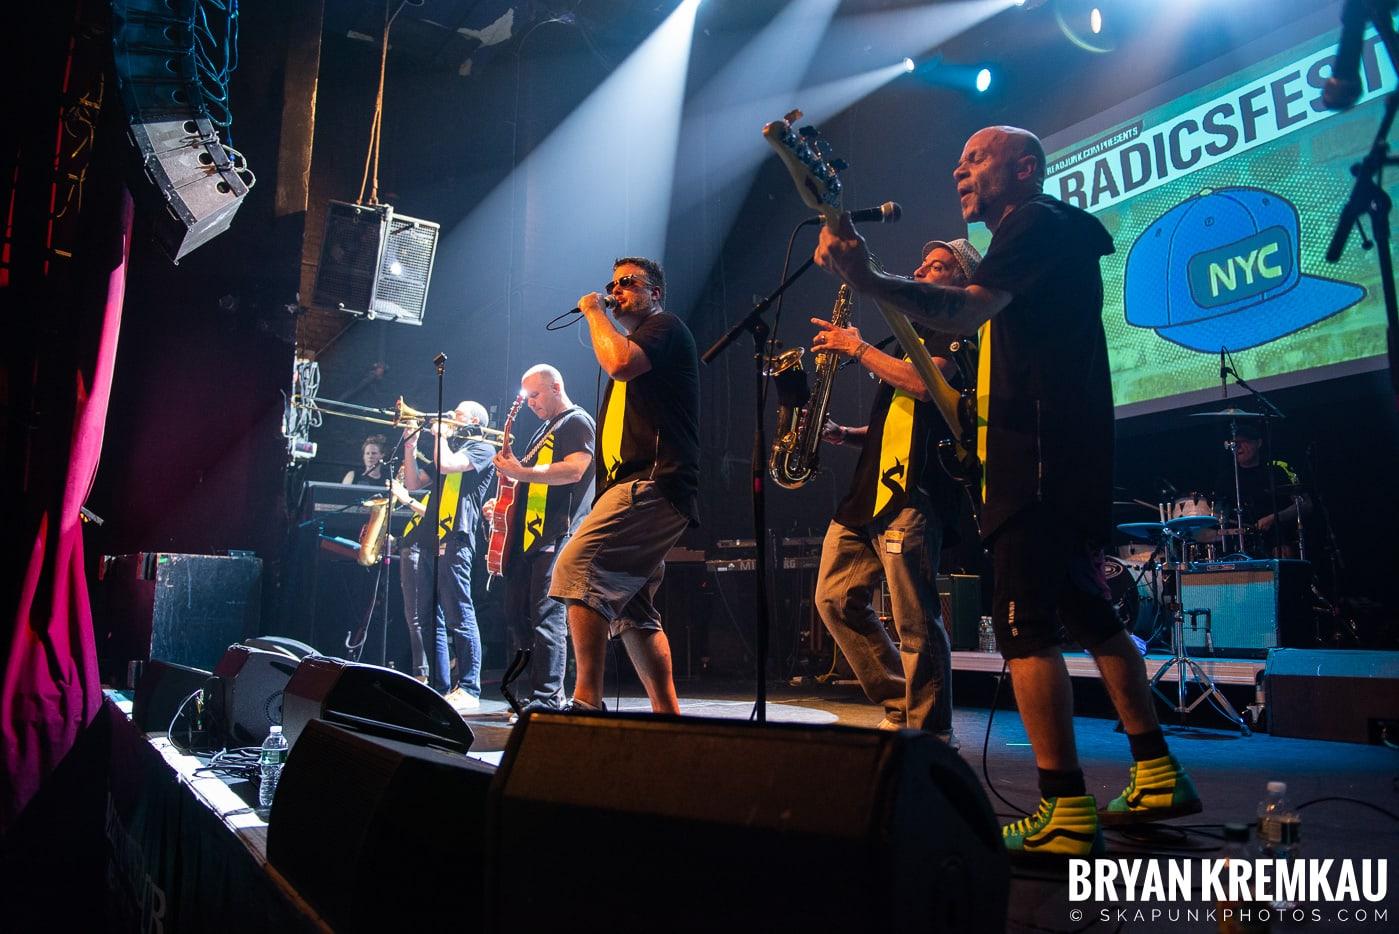 Sgt. Scagnetti @ Radicsfest, Gramercy Theatre, NYC - 7.19.19 (11)